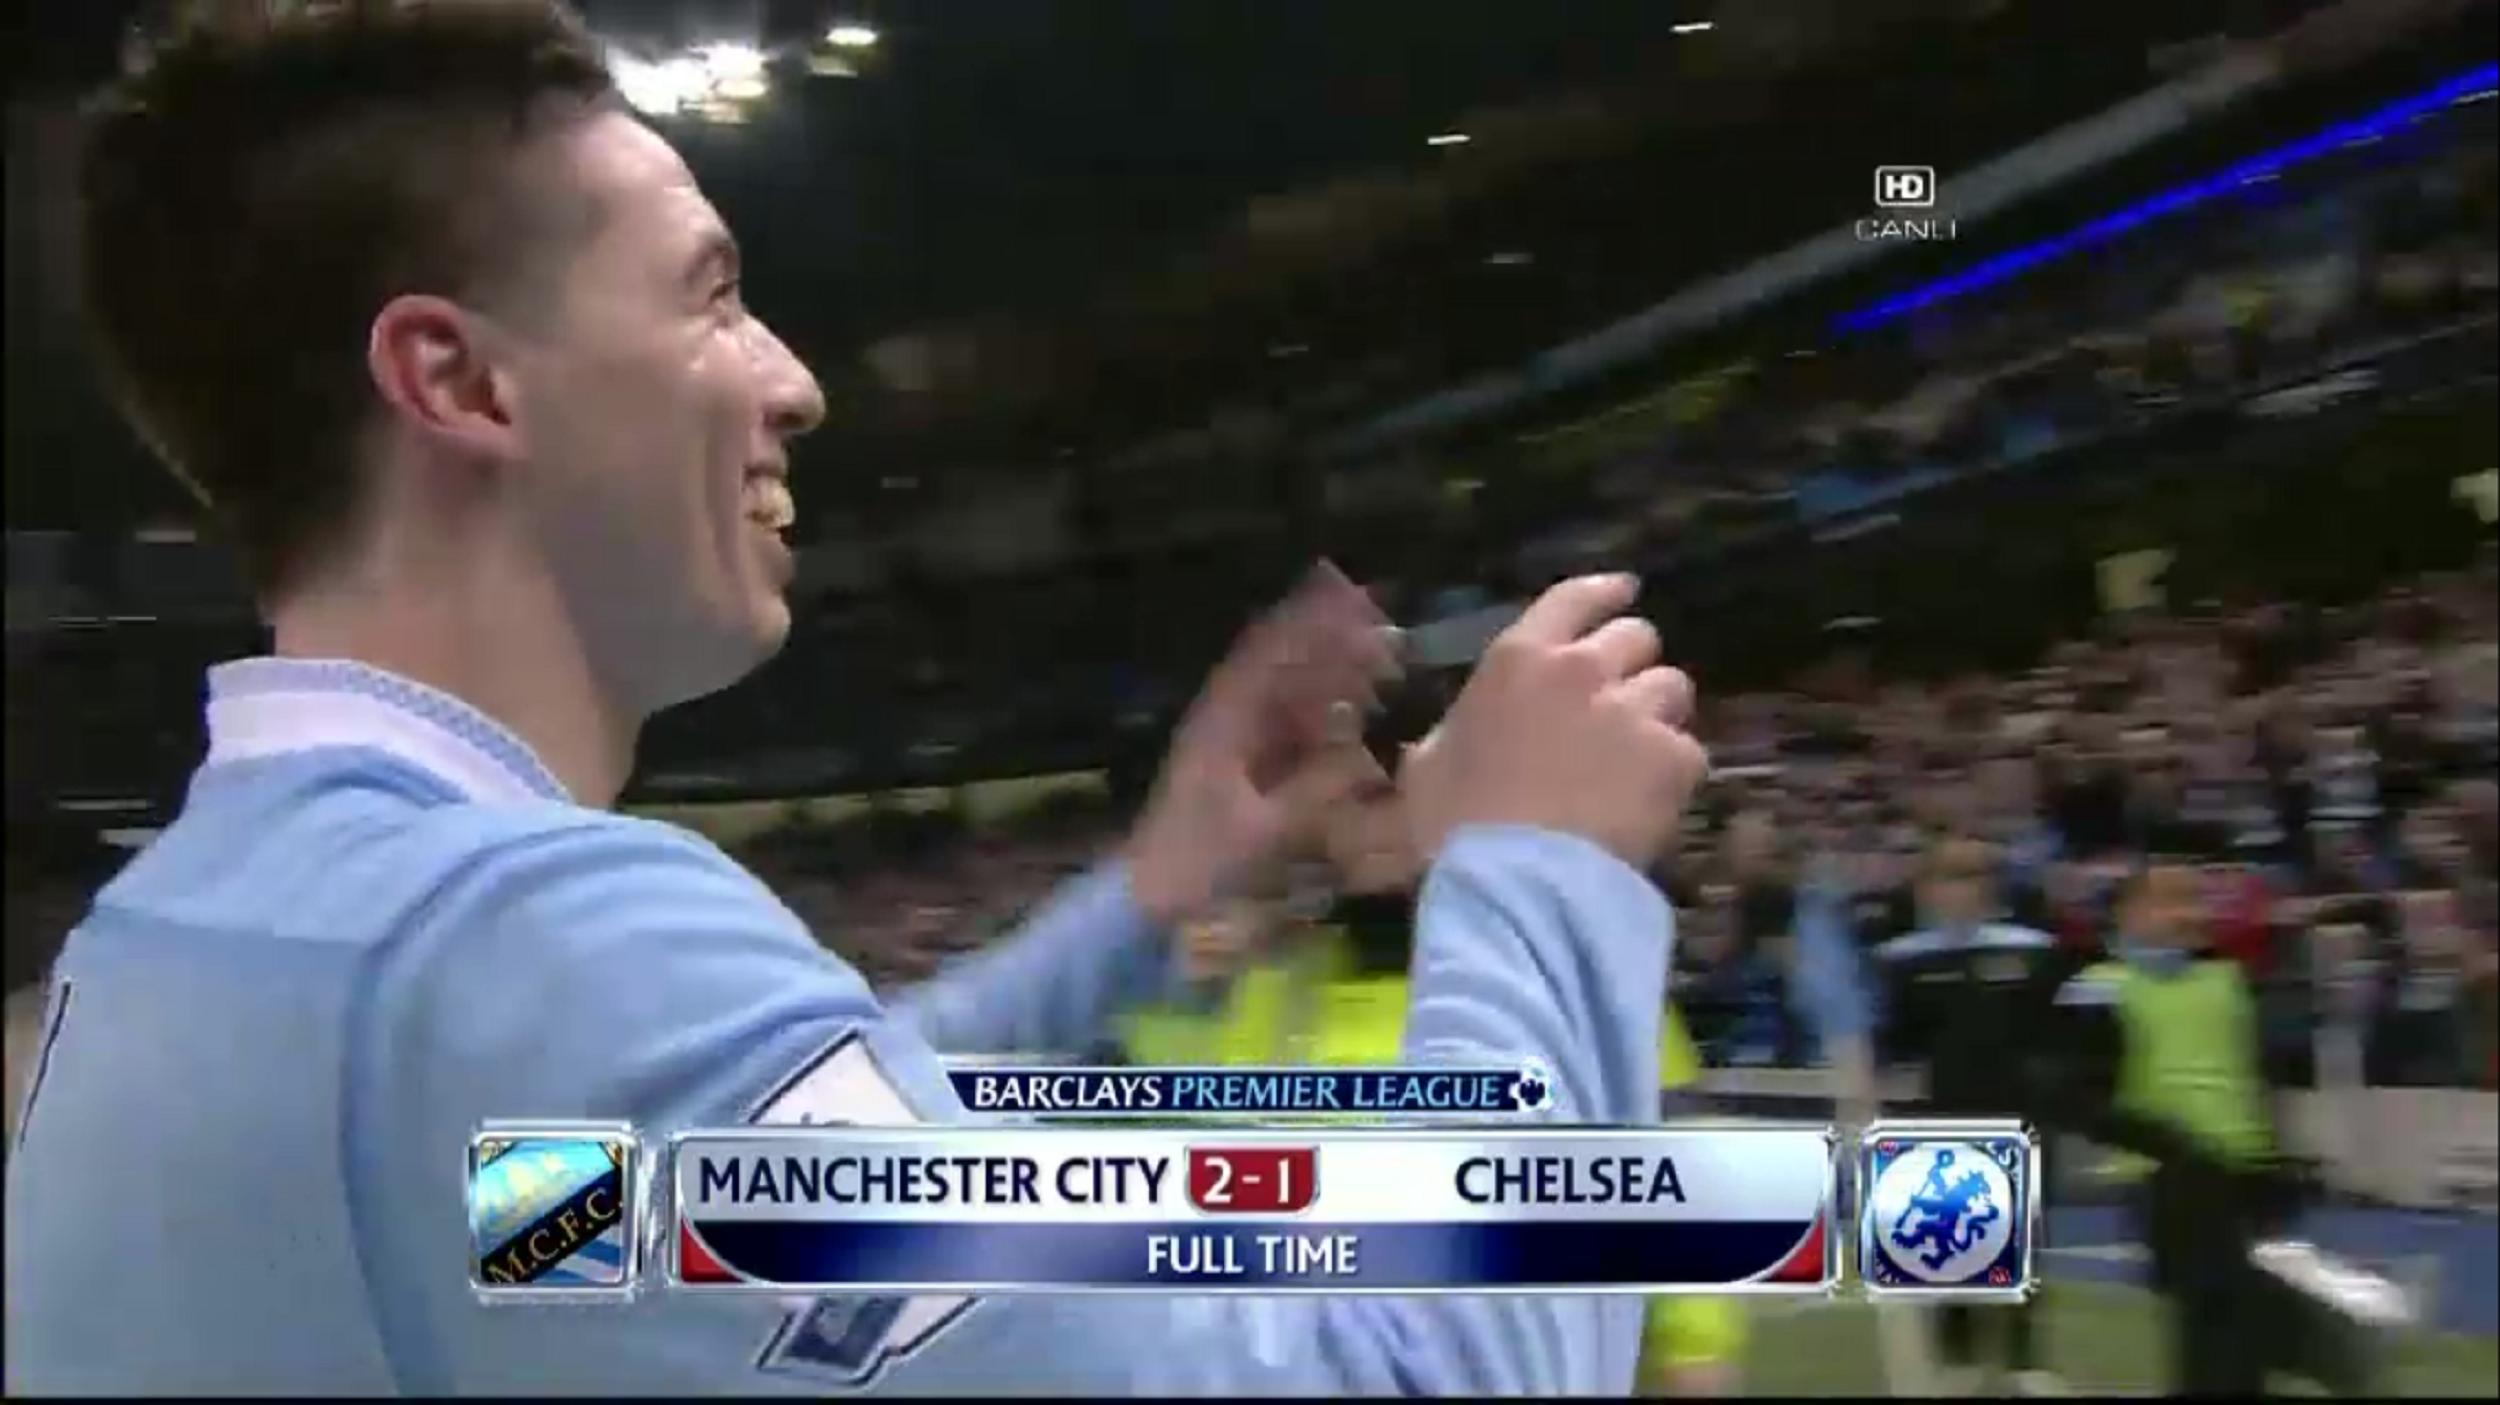 Manchester City Fc And Chelsea: 21 Mart 2012 Manchester City Chelsea Fc Maçı